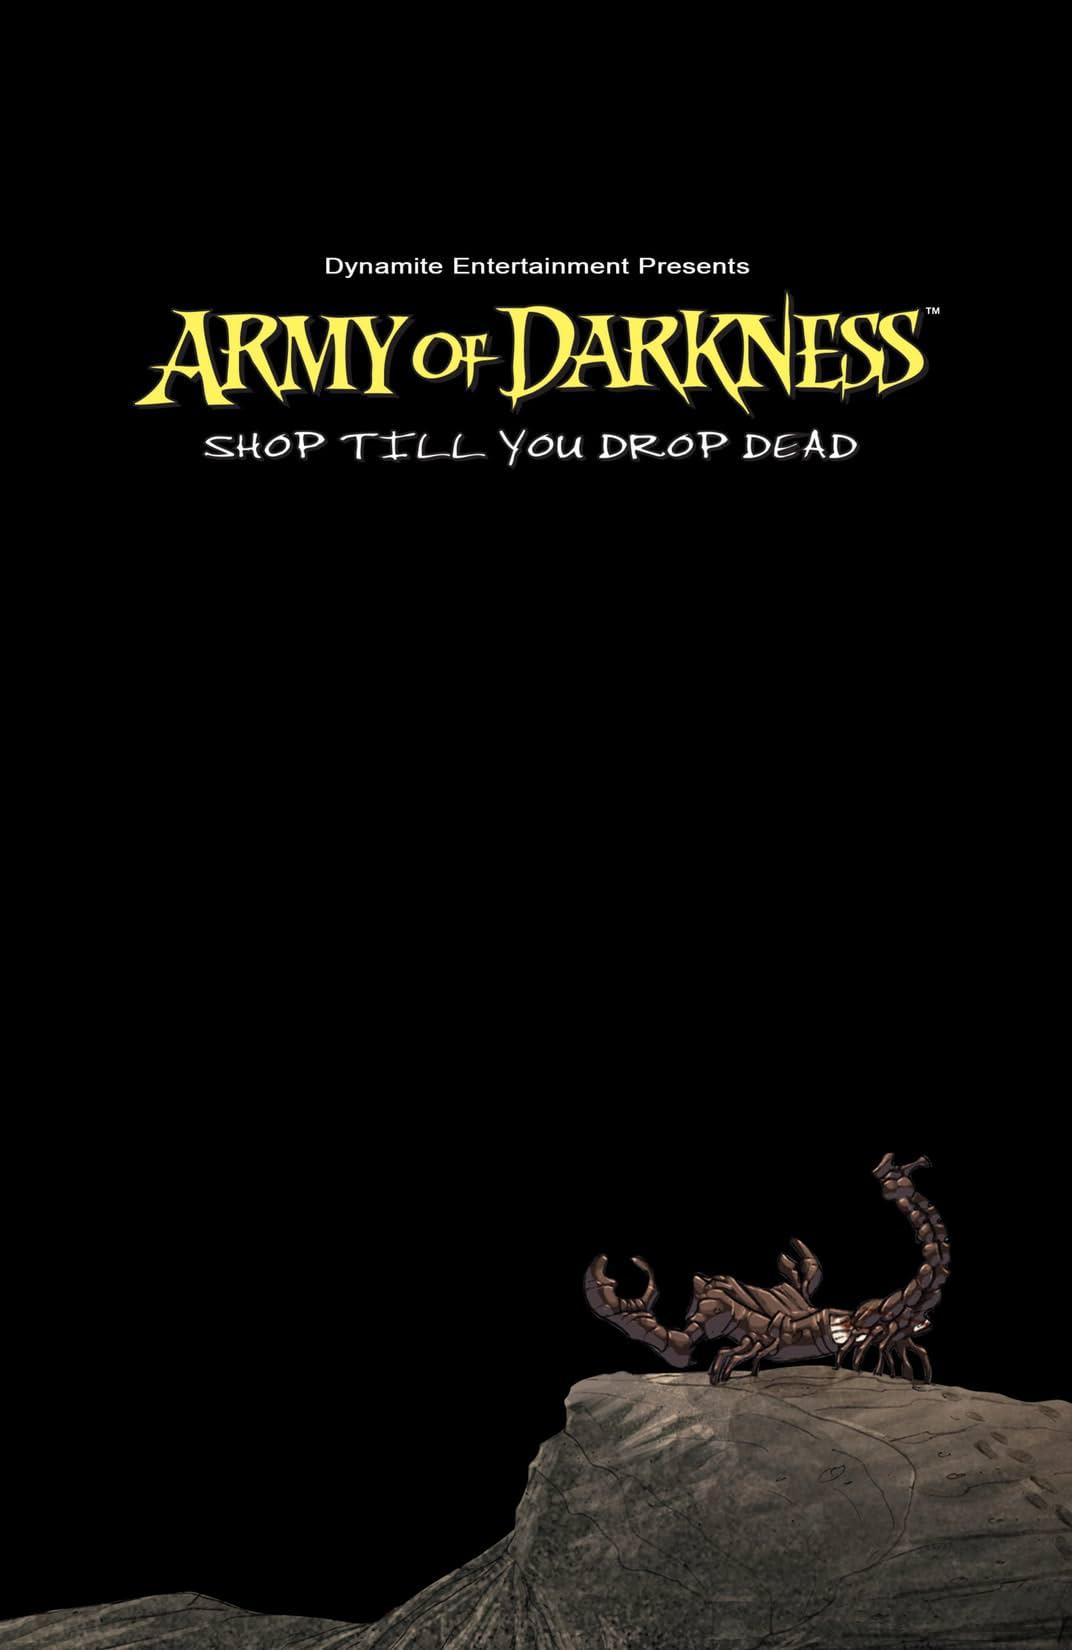 Army of Darkness Vol. 2: Shop Til You Drop Dead